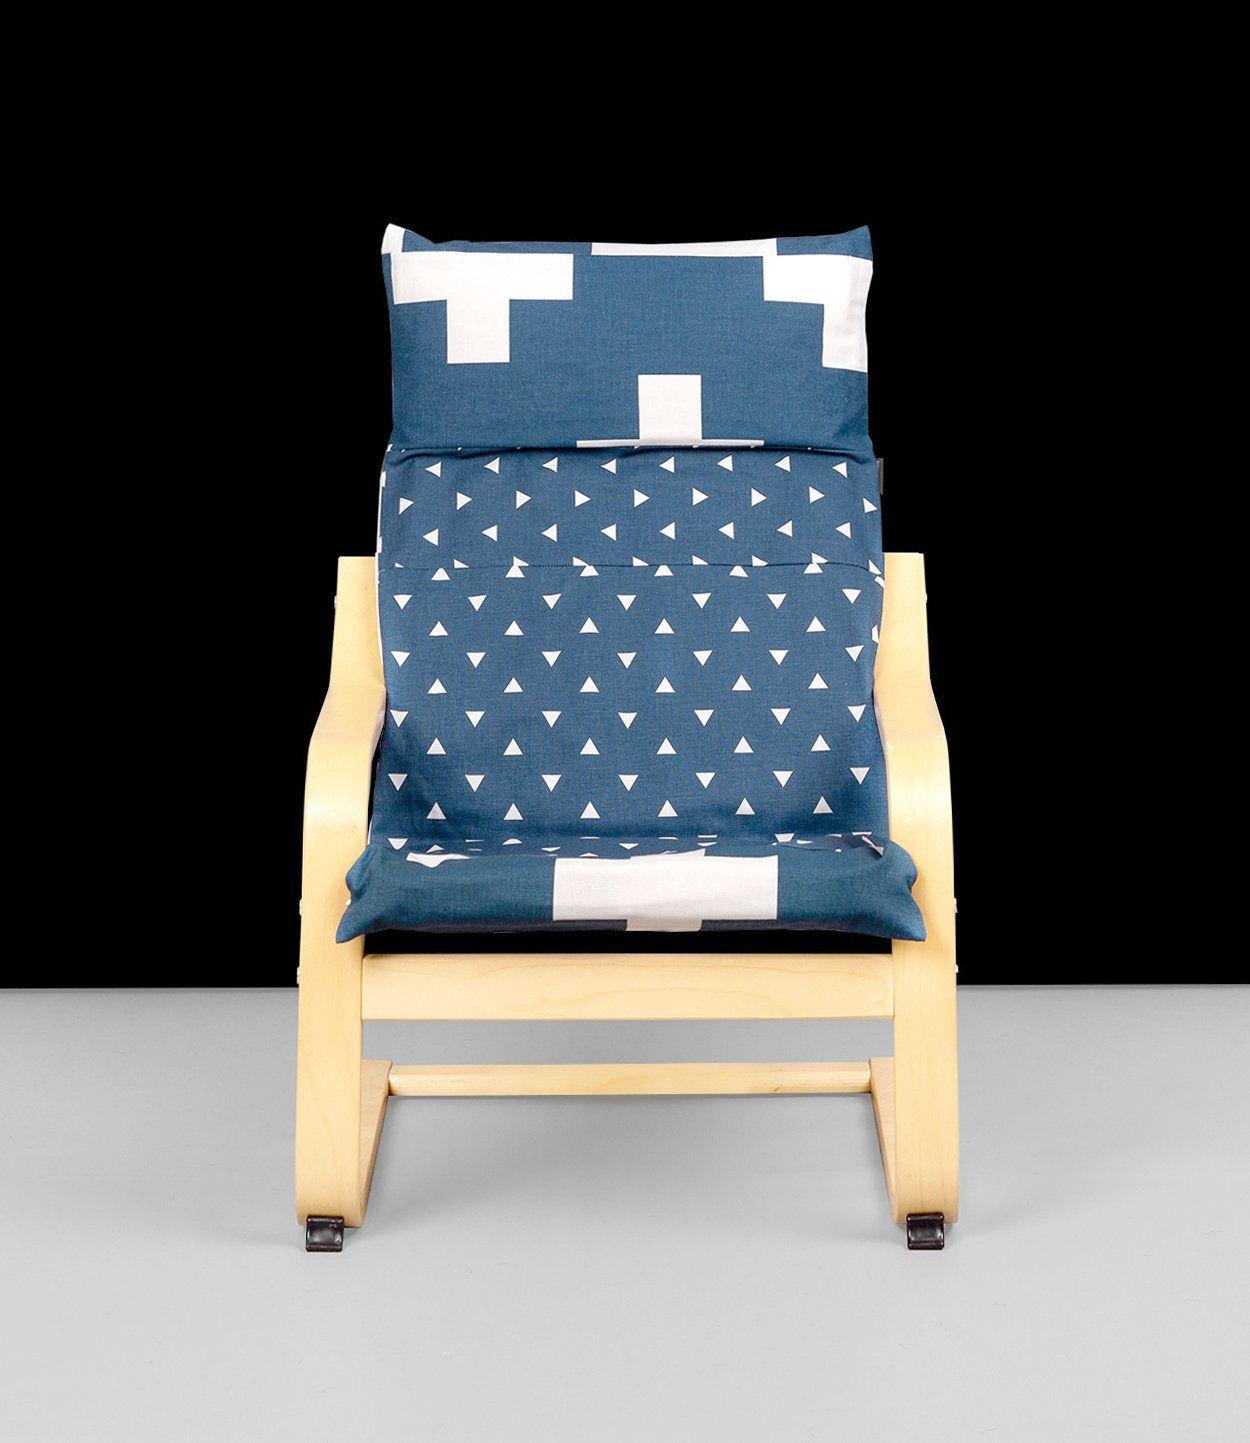 IKEA KIDS POÄNG Cushion Slipcover, Navy Blue Crosses